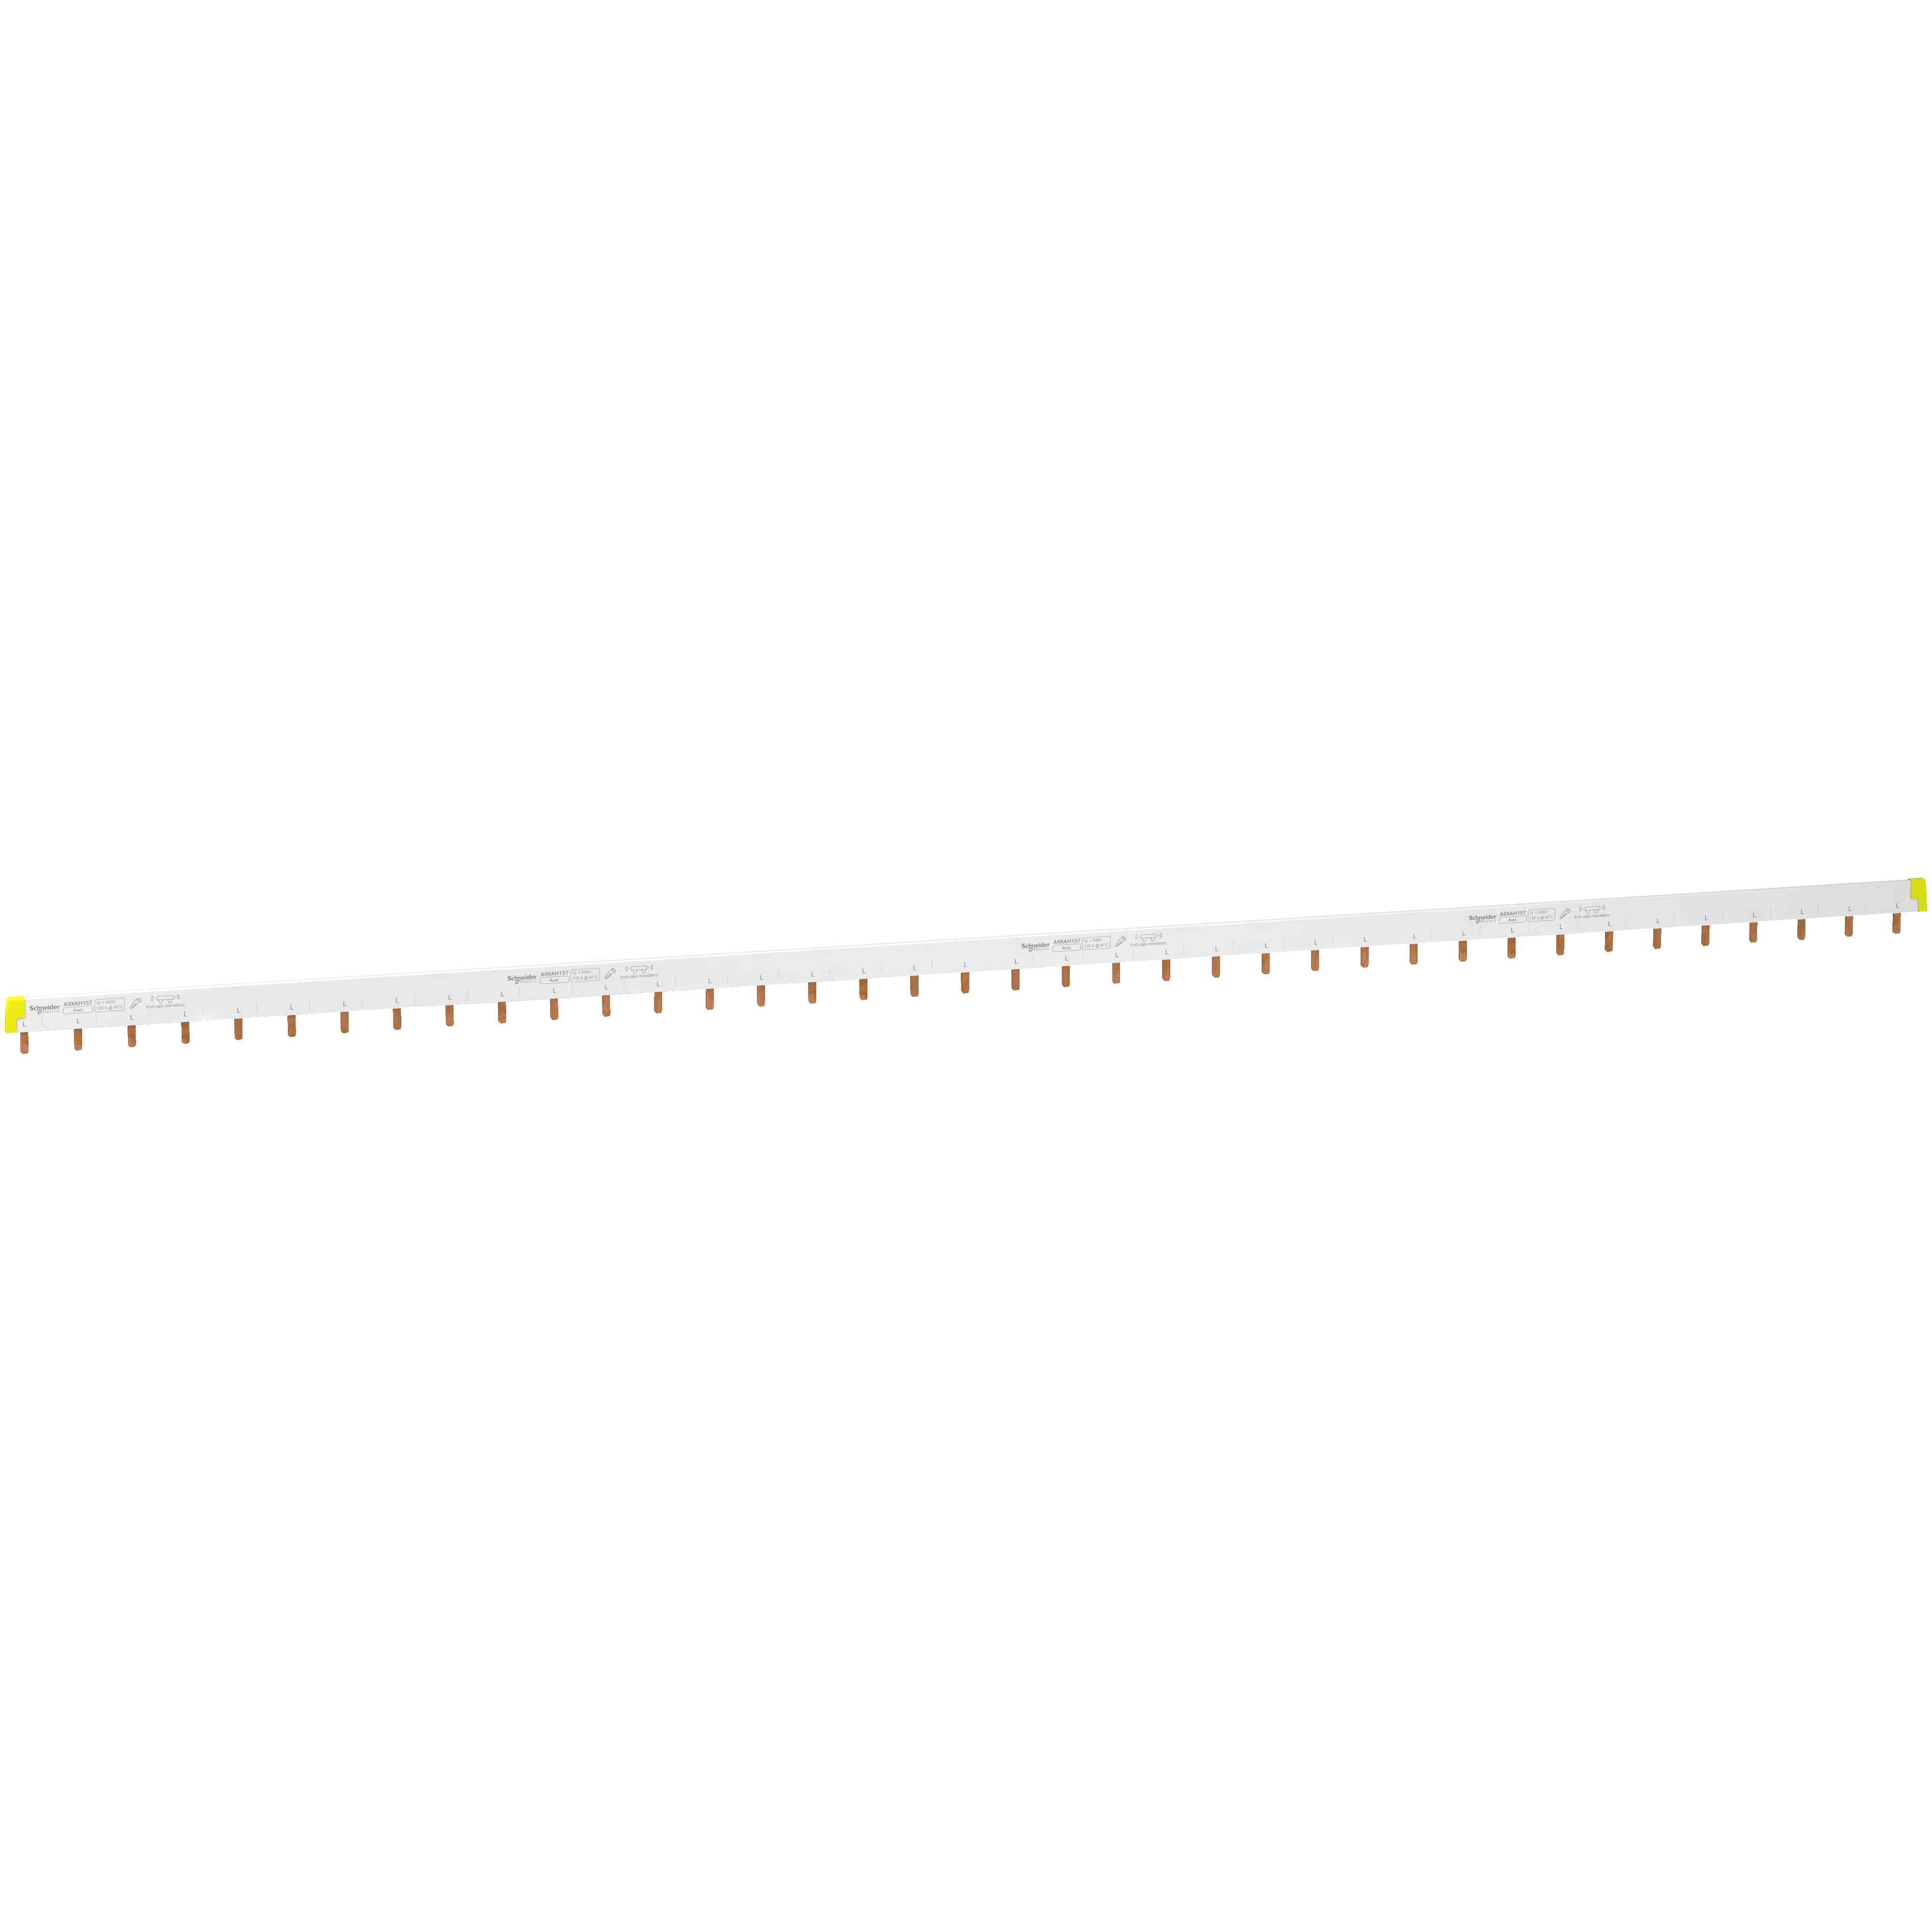 Acti 9 - glavničasta zbiralka - tip 1L + Aux - 18 mm raz. - 57 mod. - 100 A